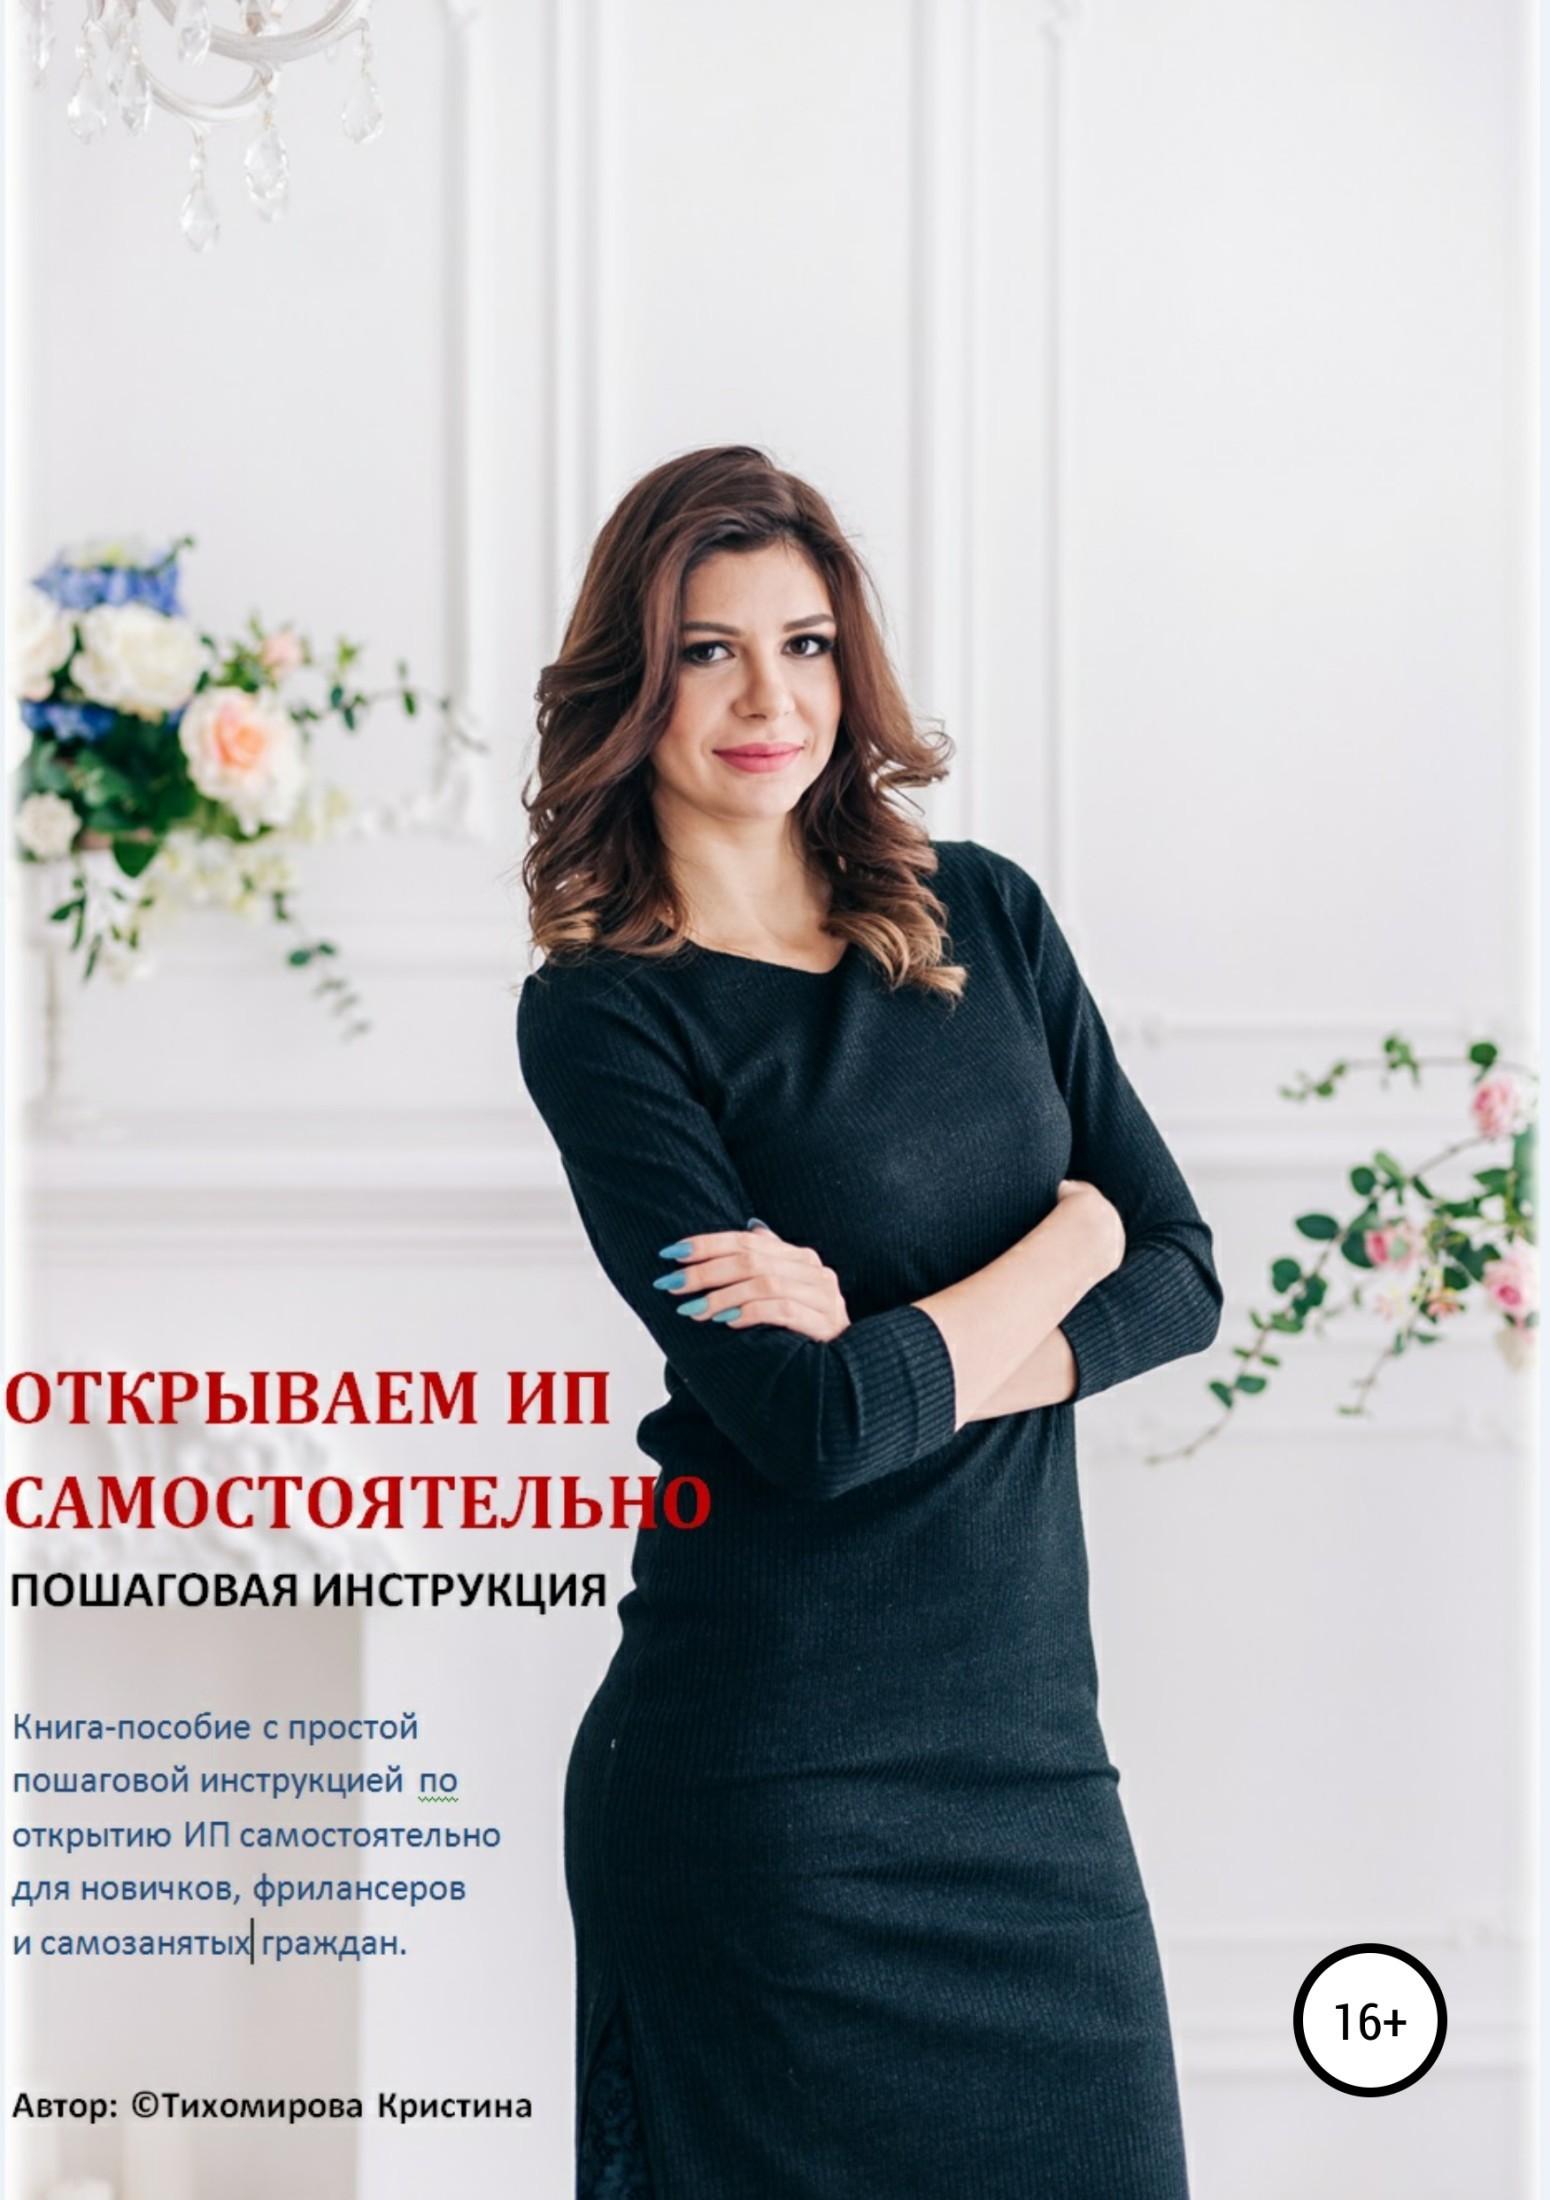 Обложка книги. Автор - Кристина Тихомирова